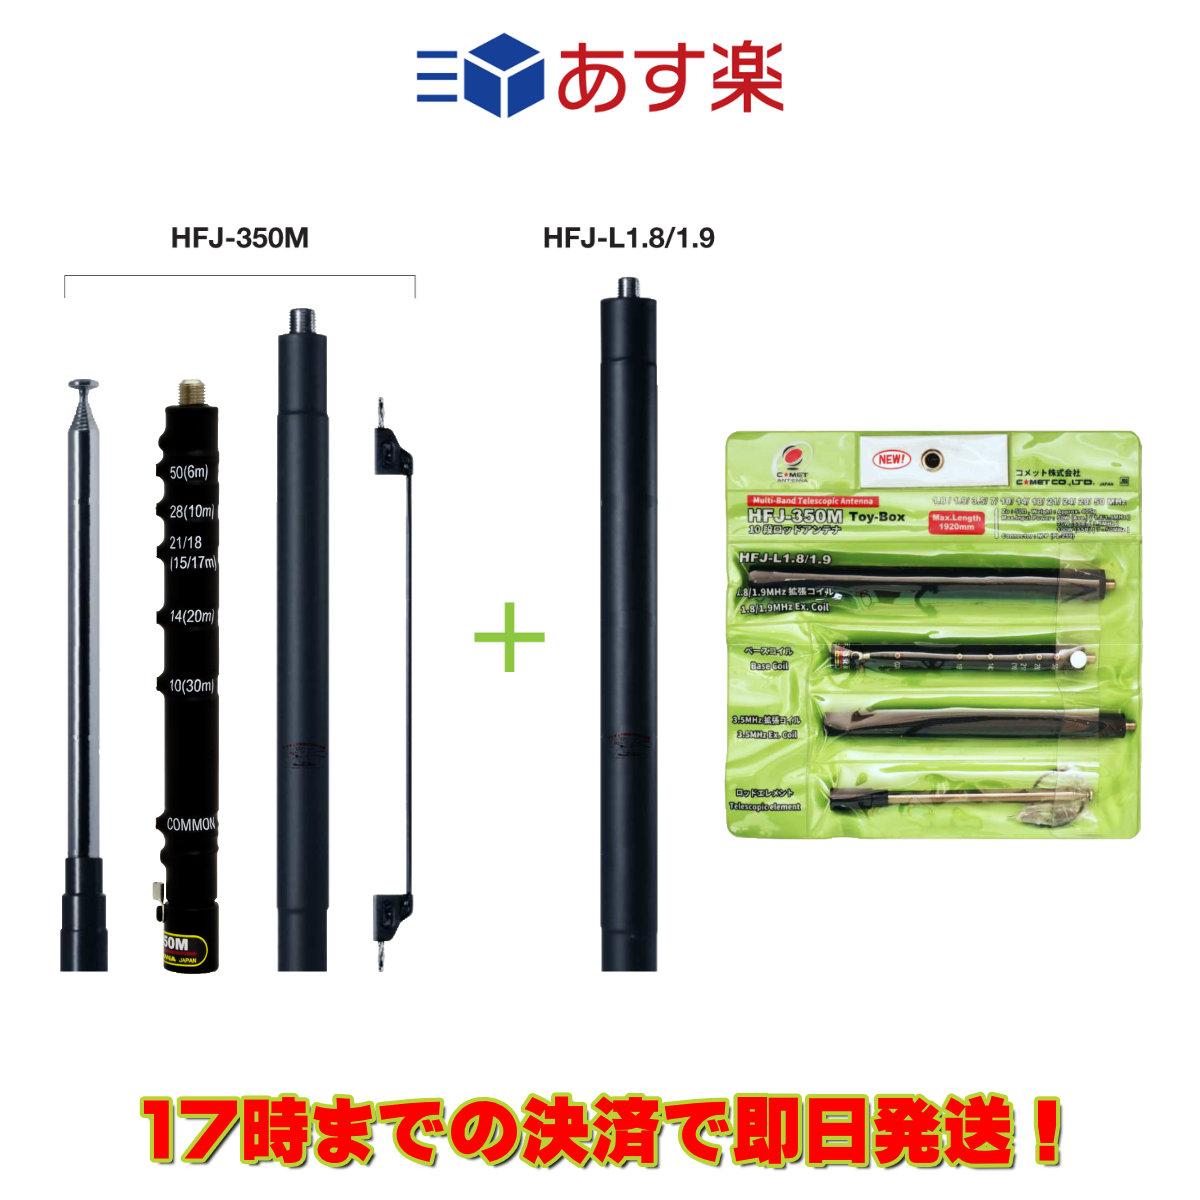 HFJ-350MとHFJ-L1.8 高級 1.9を1つにまとめたパックが登場 新作からSALEアイテム等お得な商品満載 HFJ-350M コメット Toy-Box マルチバンドMF~50MHz帯用アンテナ